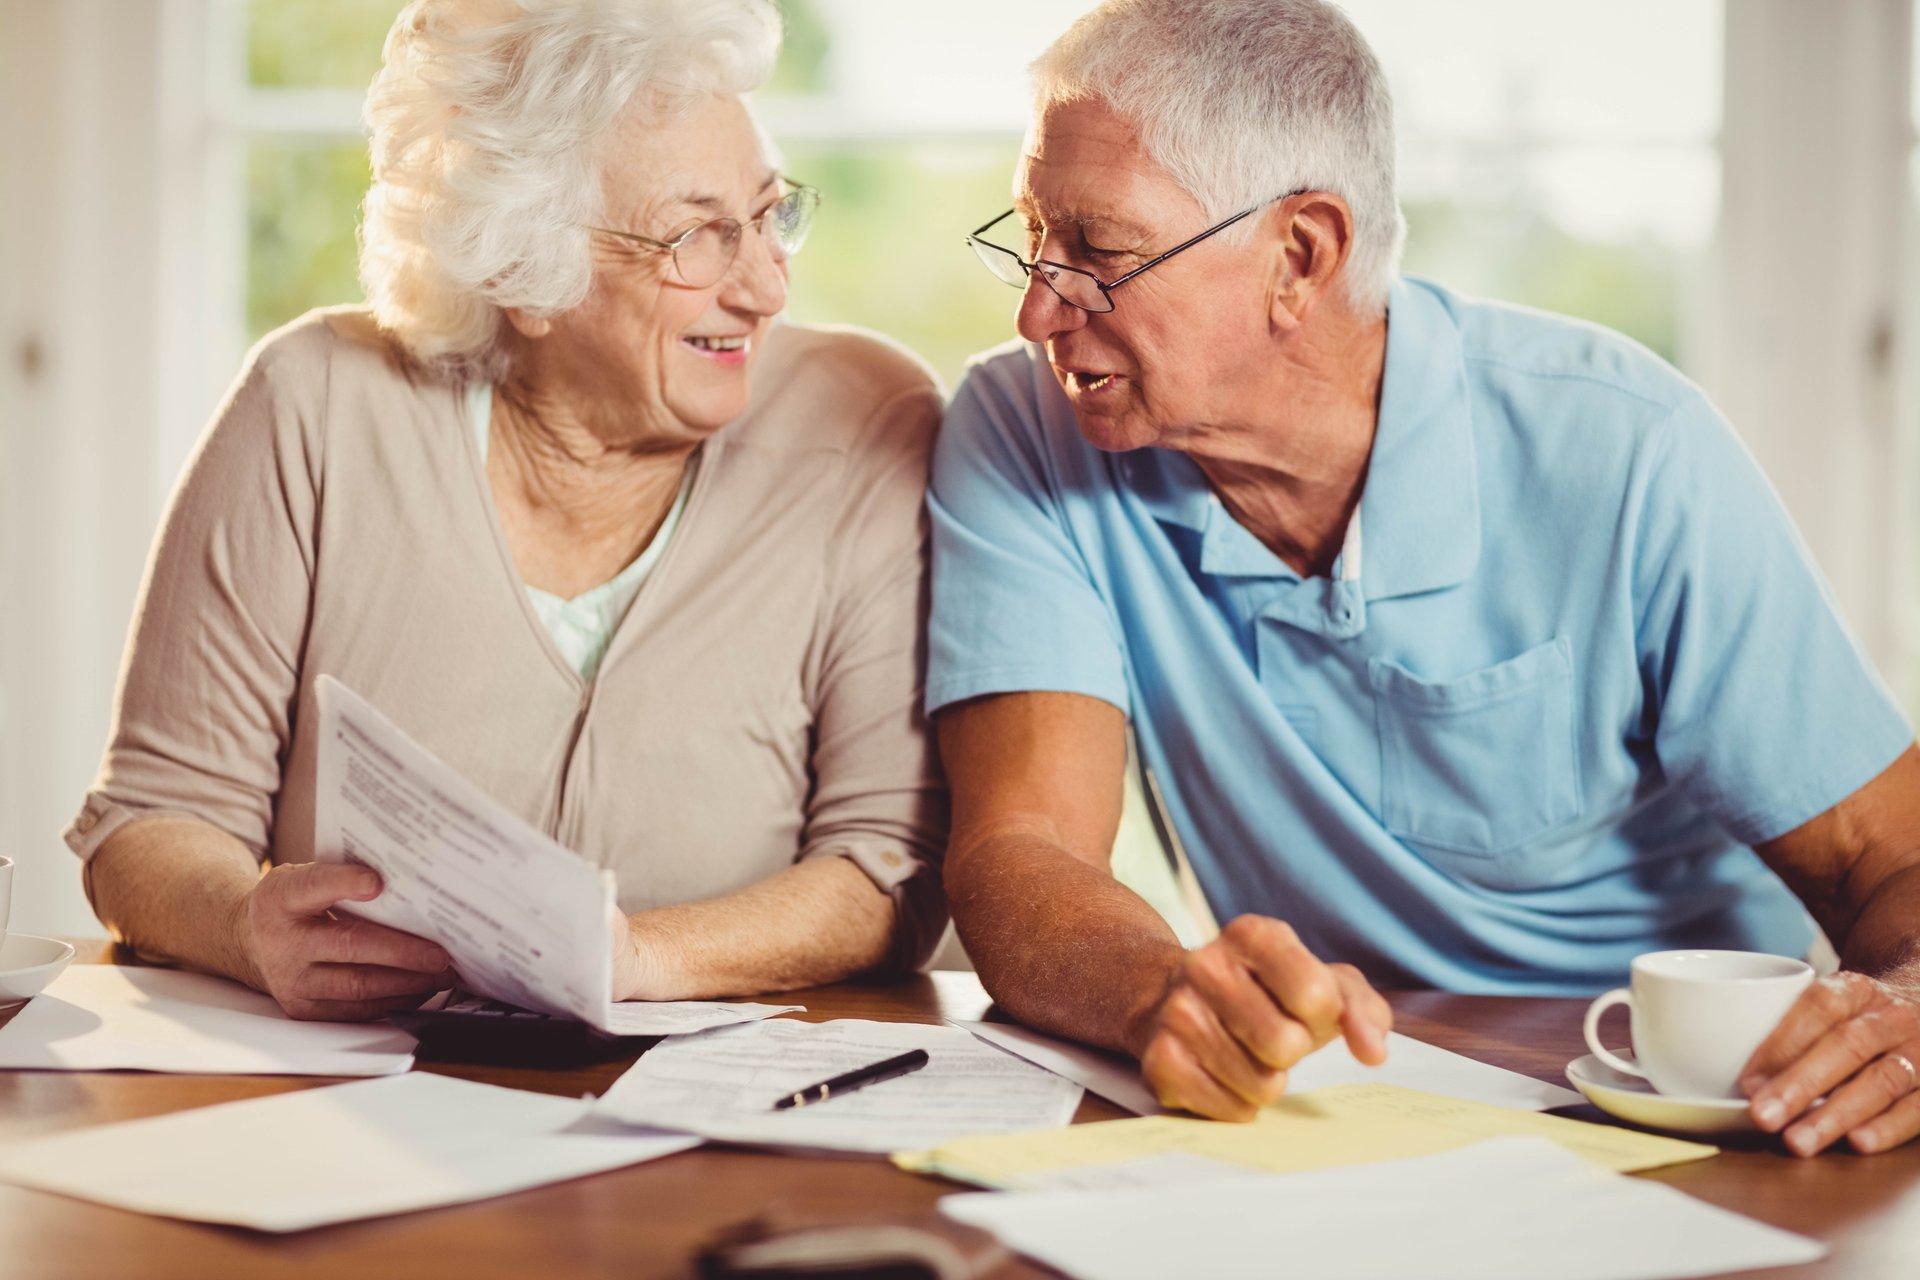 A senior couple pays bills